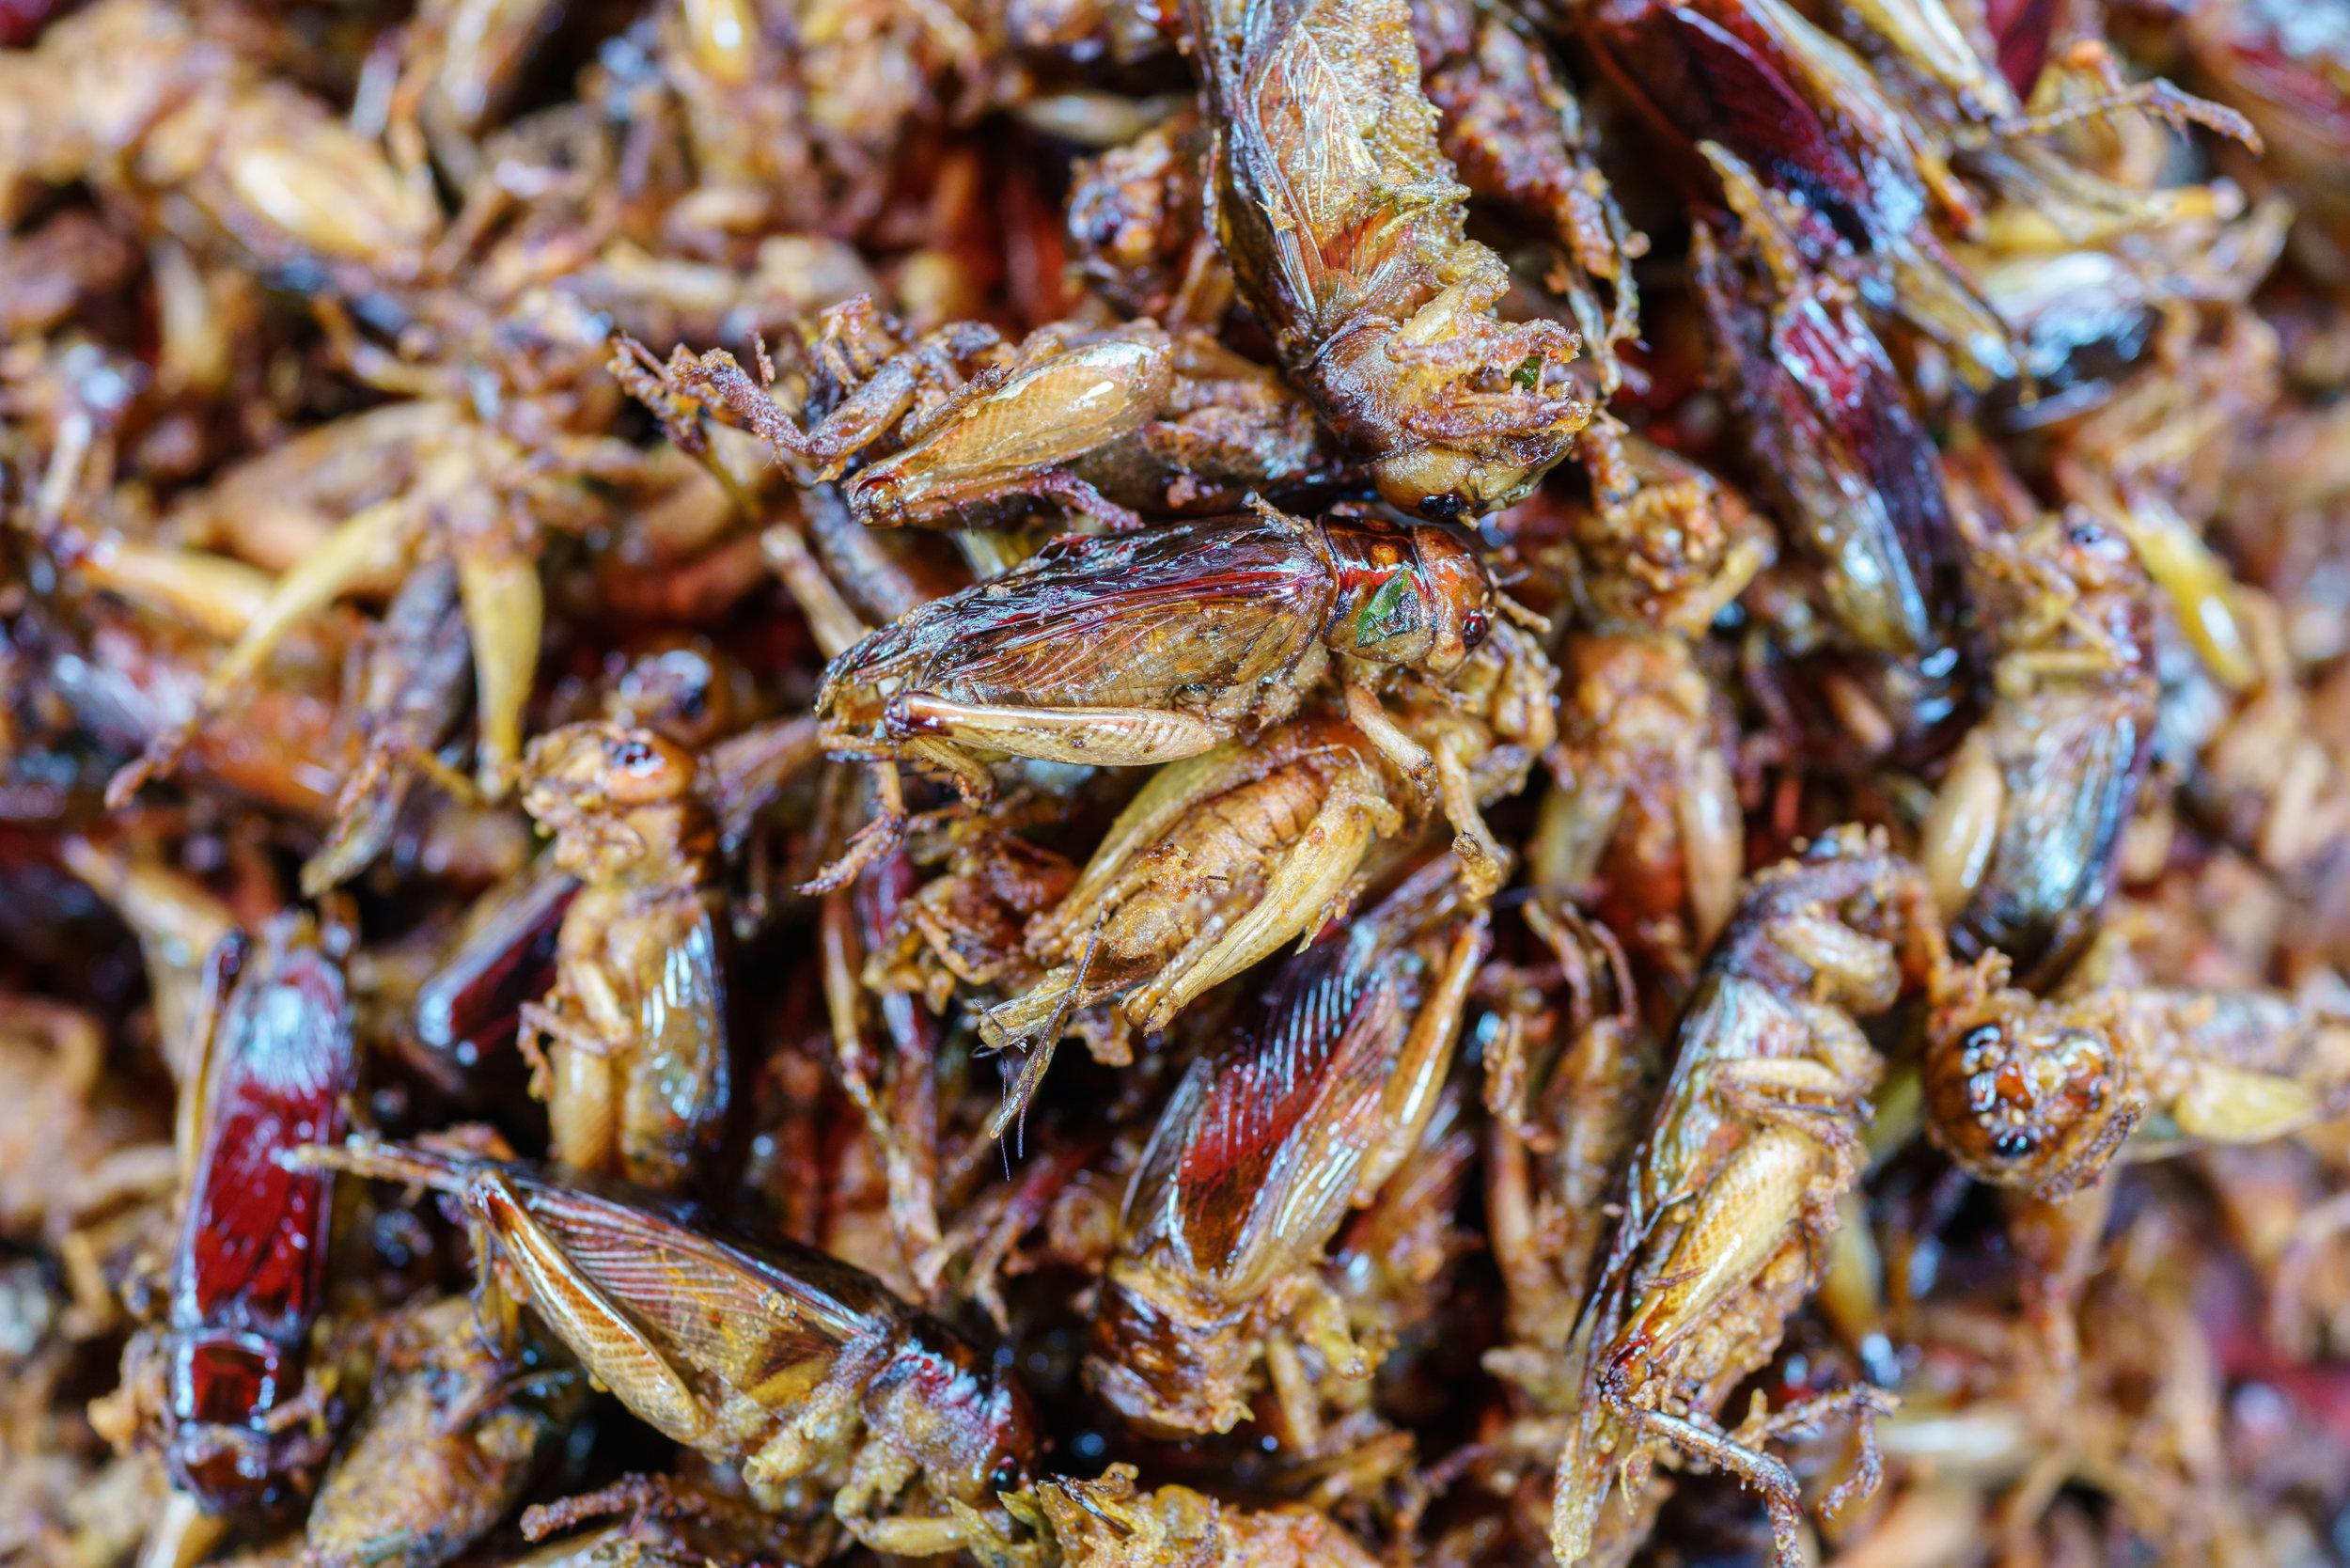 Crunchy crickets